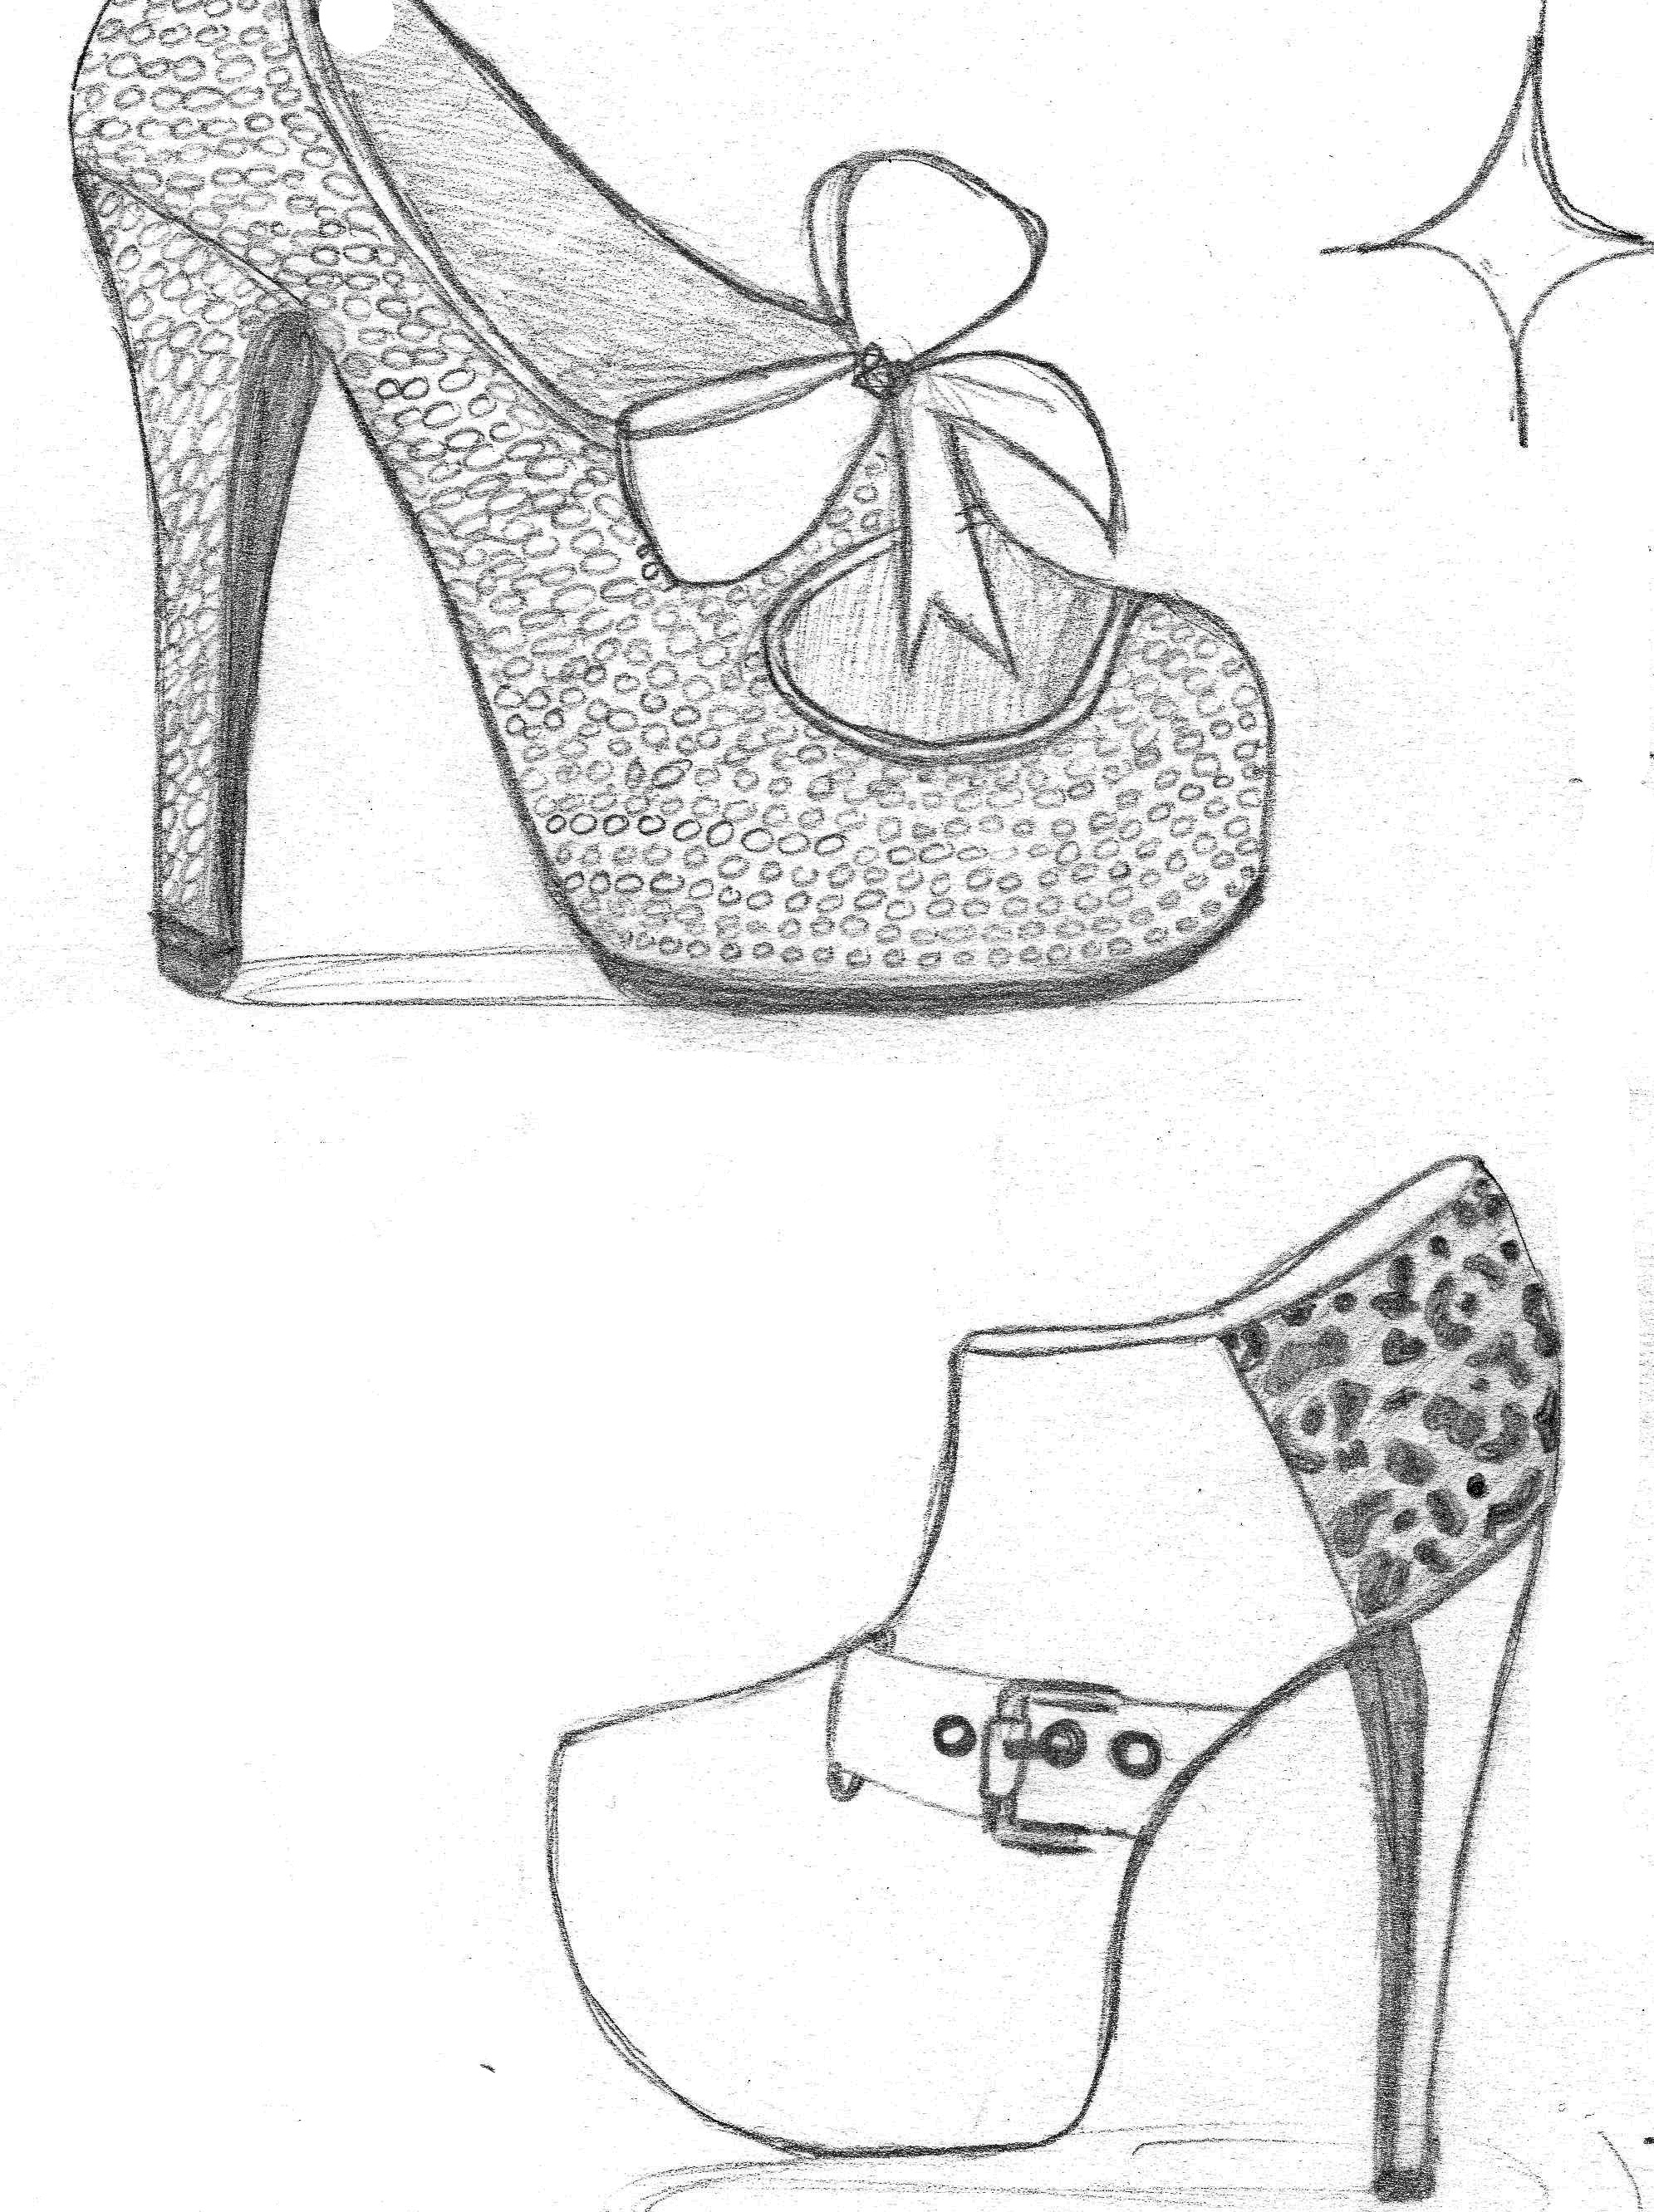 how to sketch high heels hafiz39s fashion sketching high heels sketches high sketch how to heels